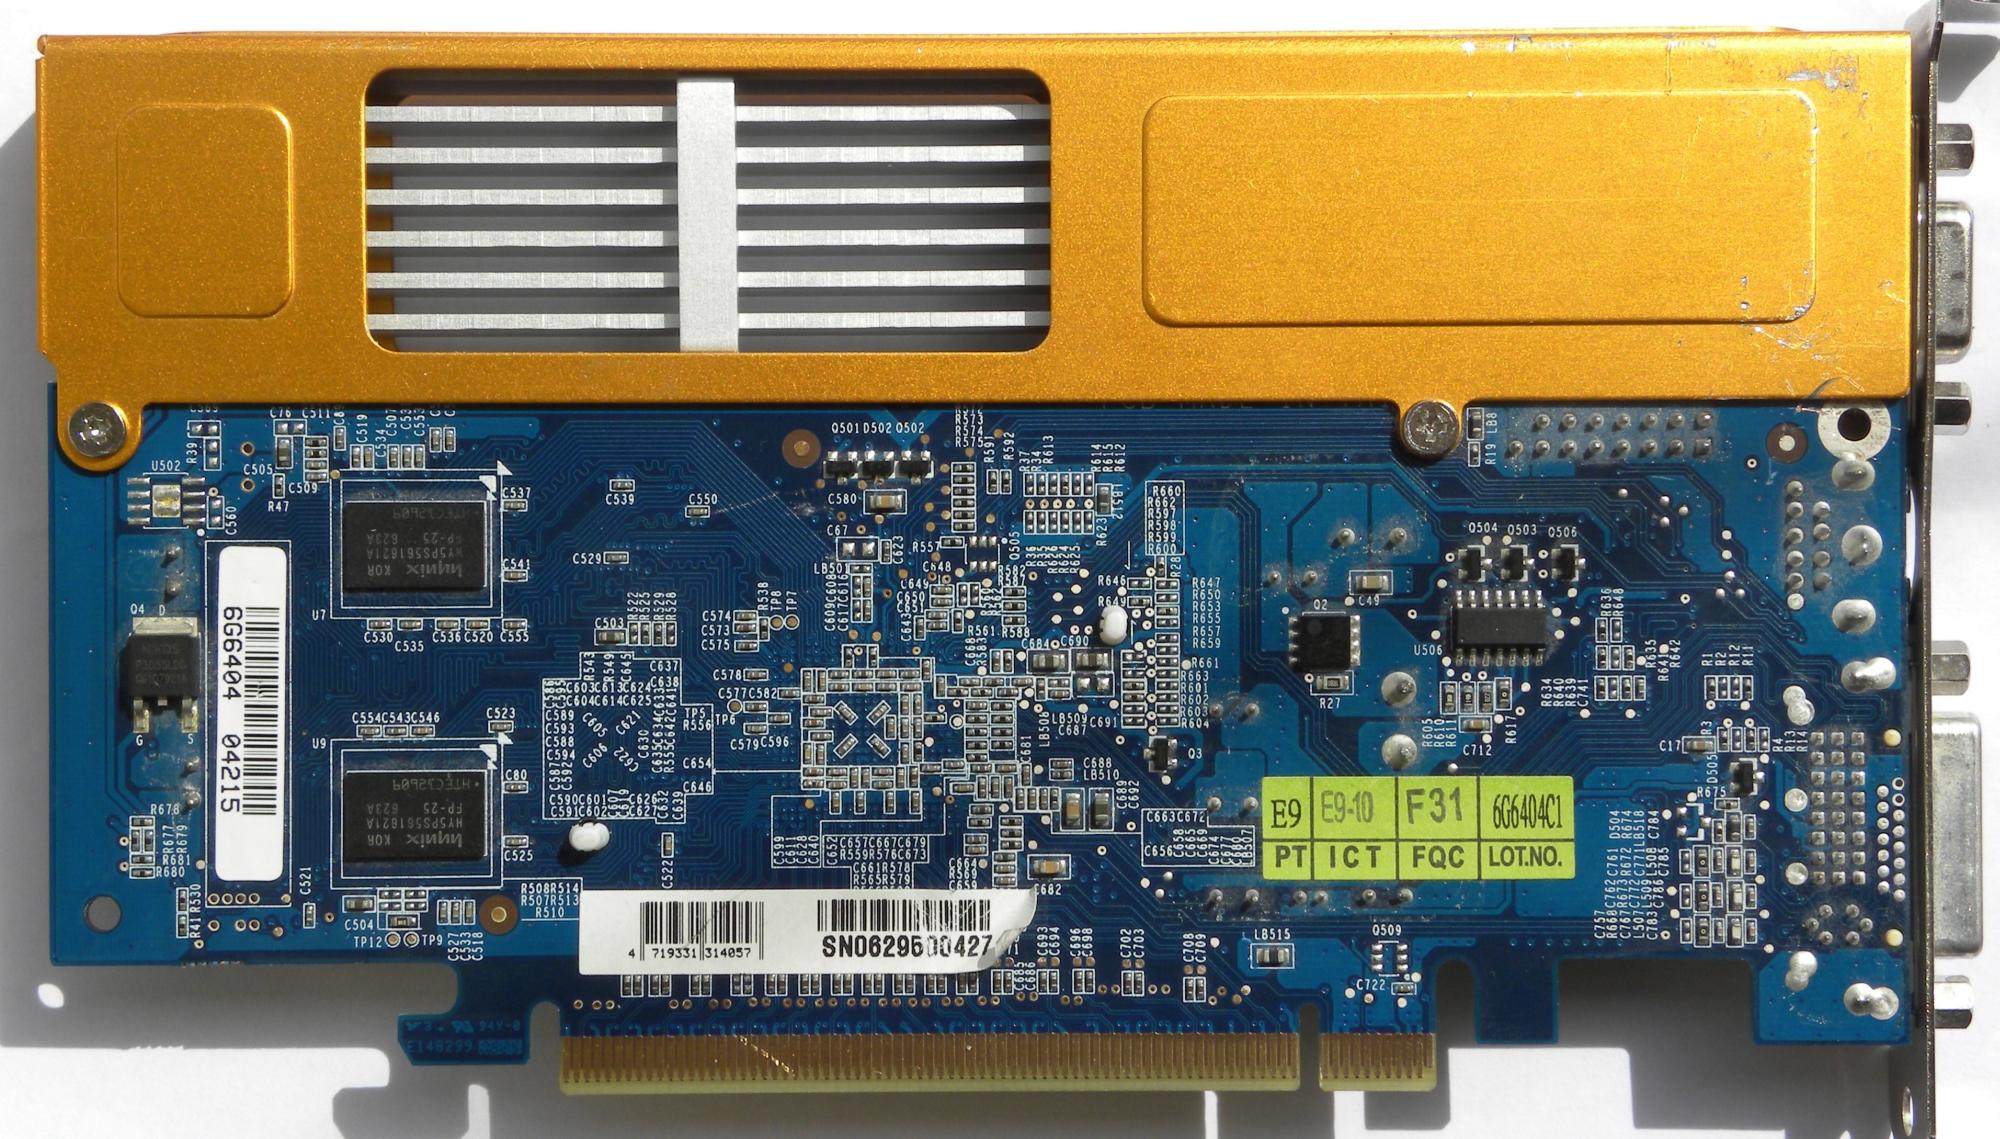 Nvidia Geforce 7300 Se 7200 Gs Driver Windows 10